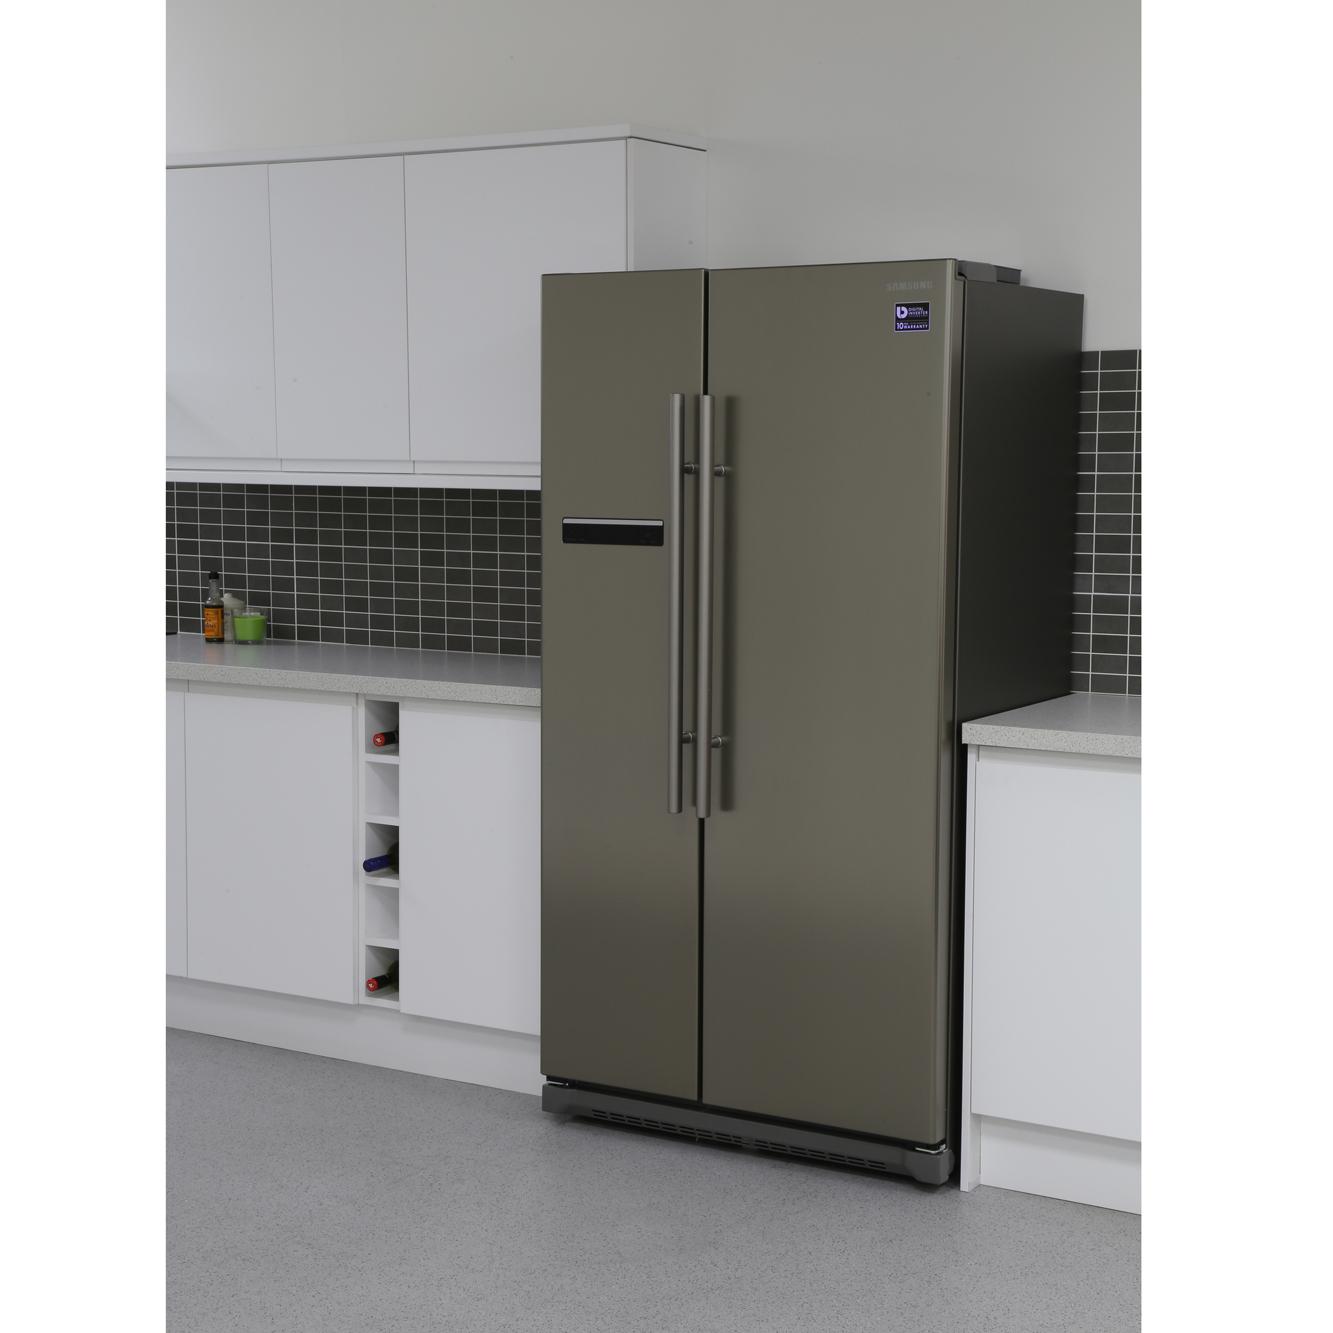 Buy Samsung Rsa1shpn1 American Fridge Freezer Platinum